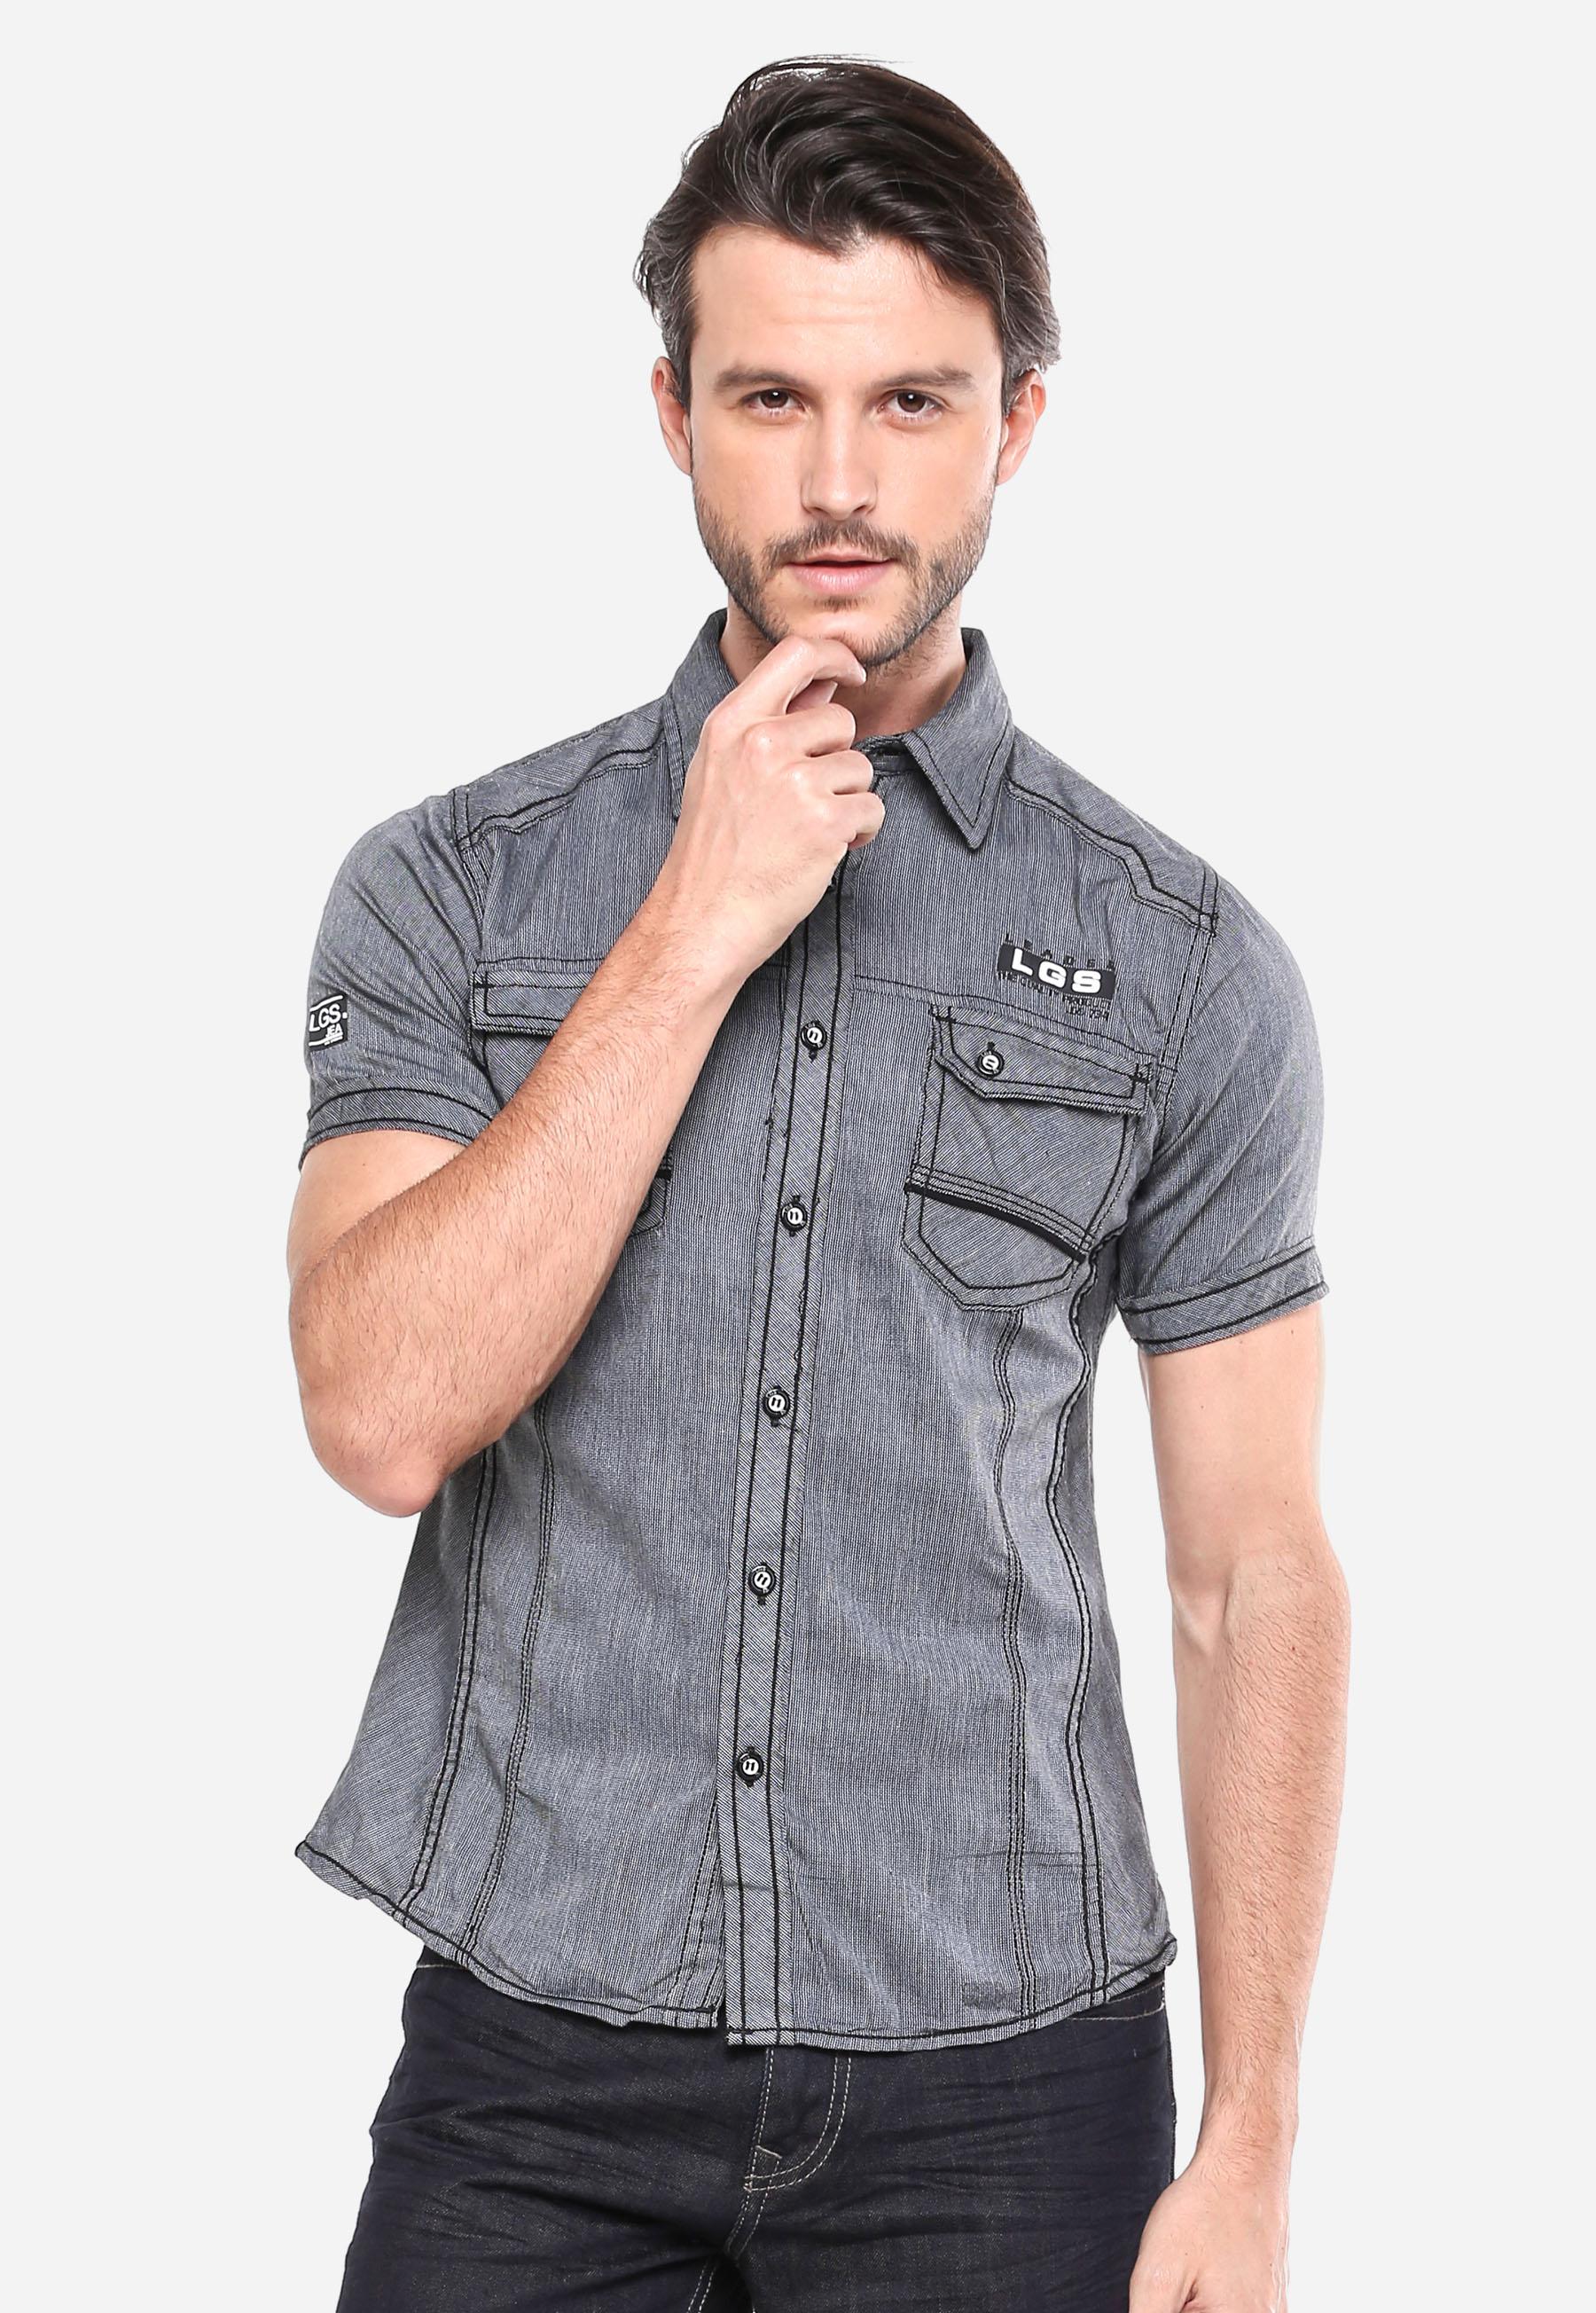 Lgsgeneration Shop Line Lgs Slim Fit Kaos Polo Biru Navy Garis Putih M Kemeja Fashion Abu Motif Halus